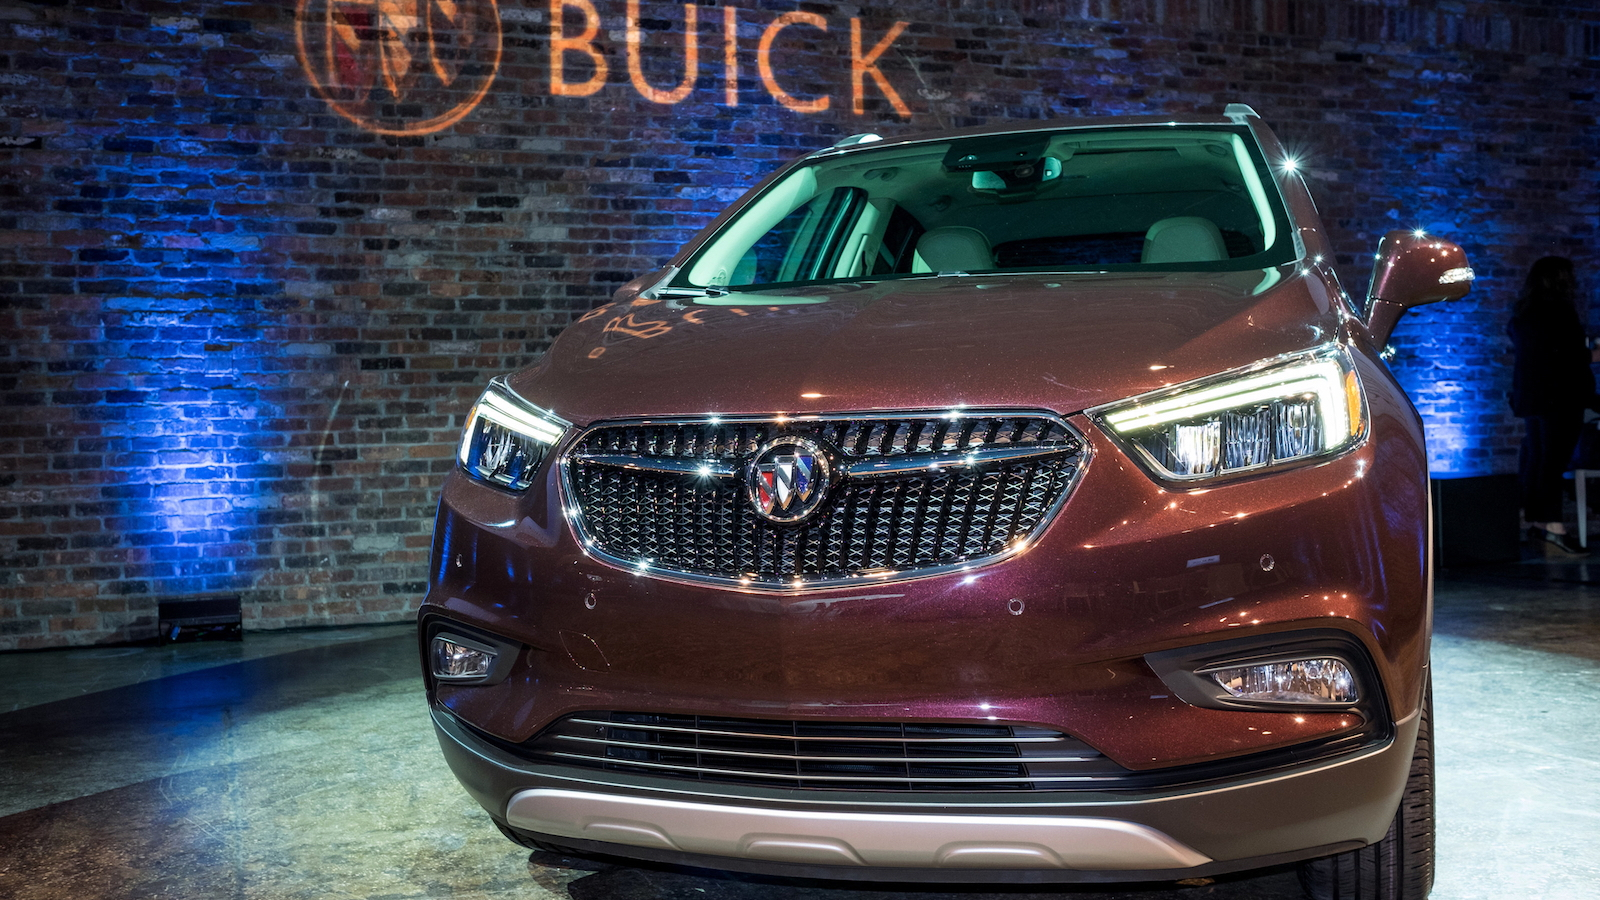 2017 Buick Encore, 2016 New York Auto Show